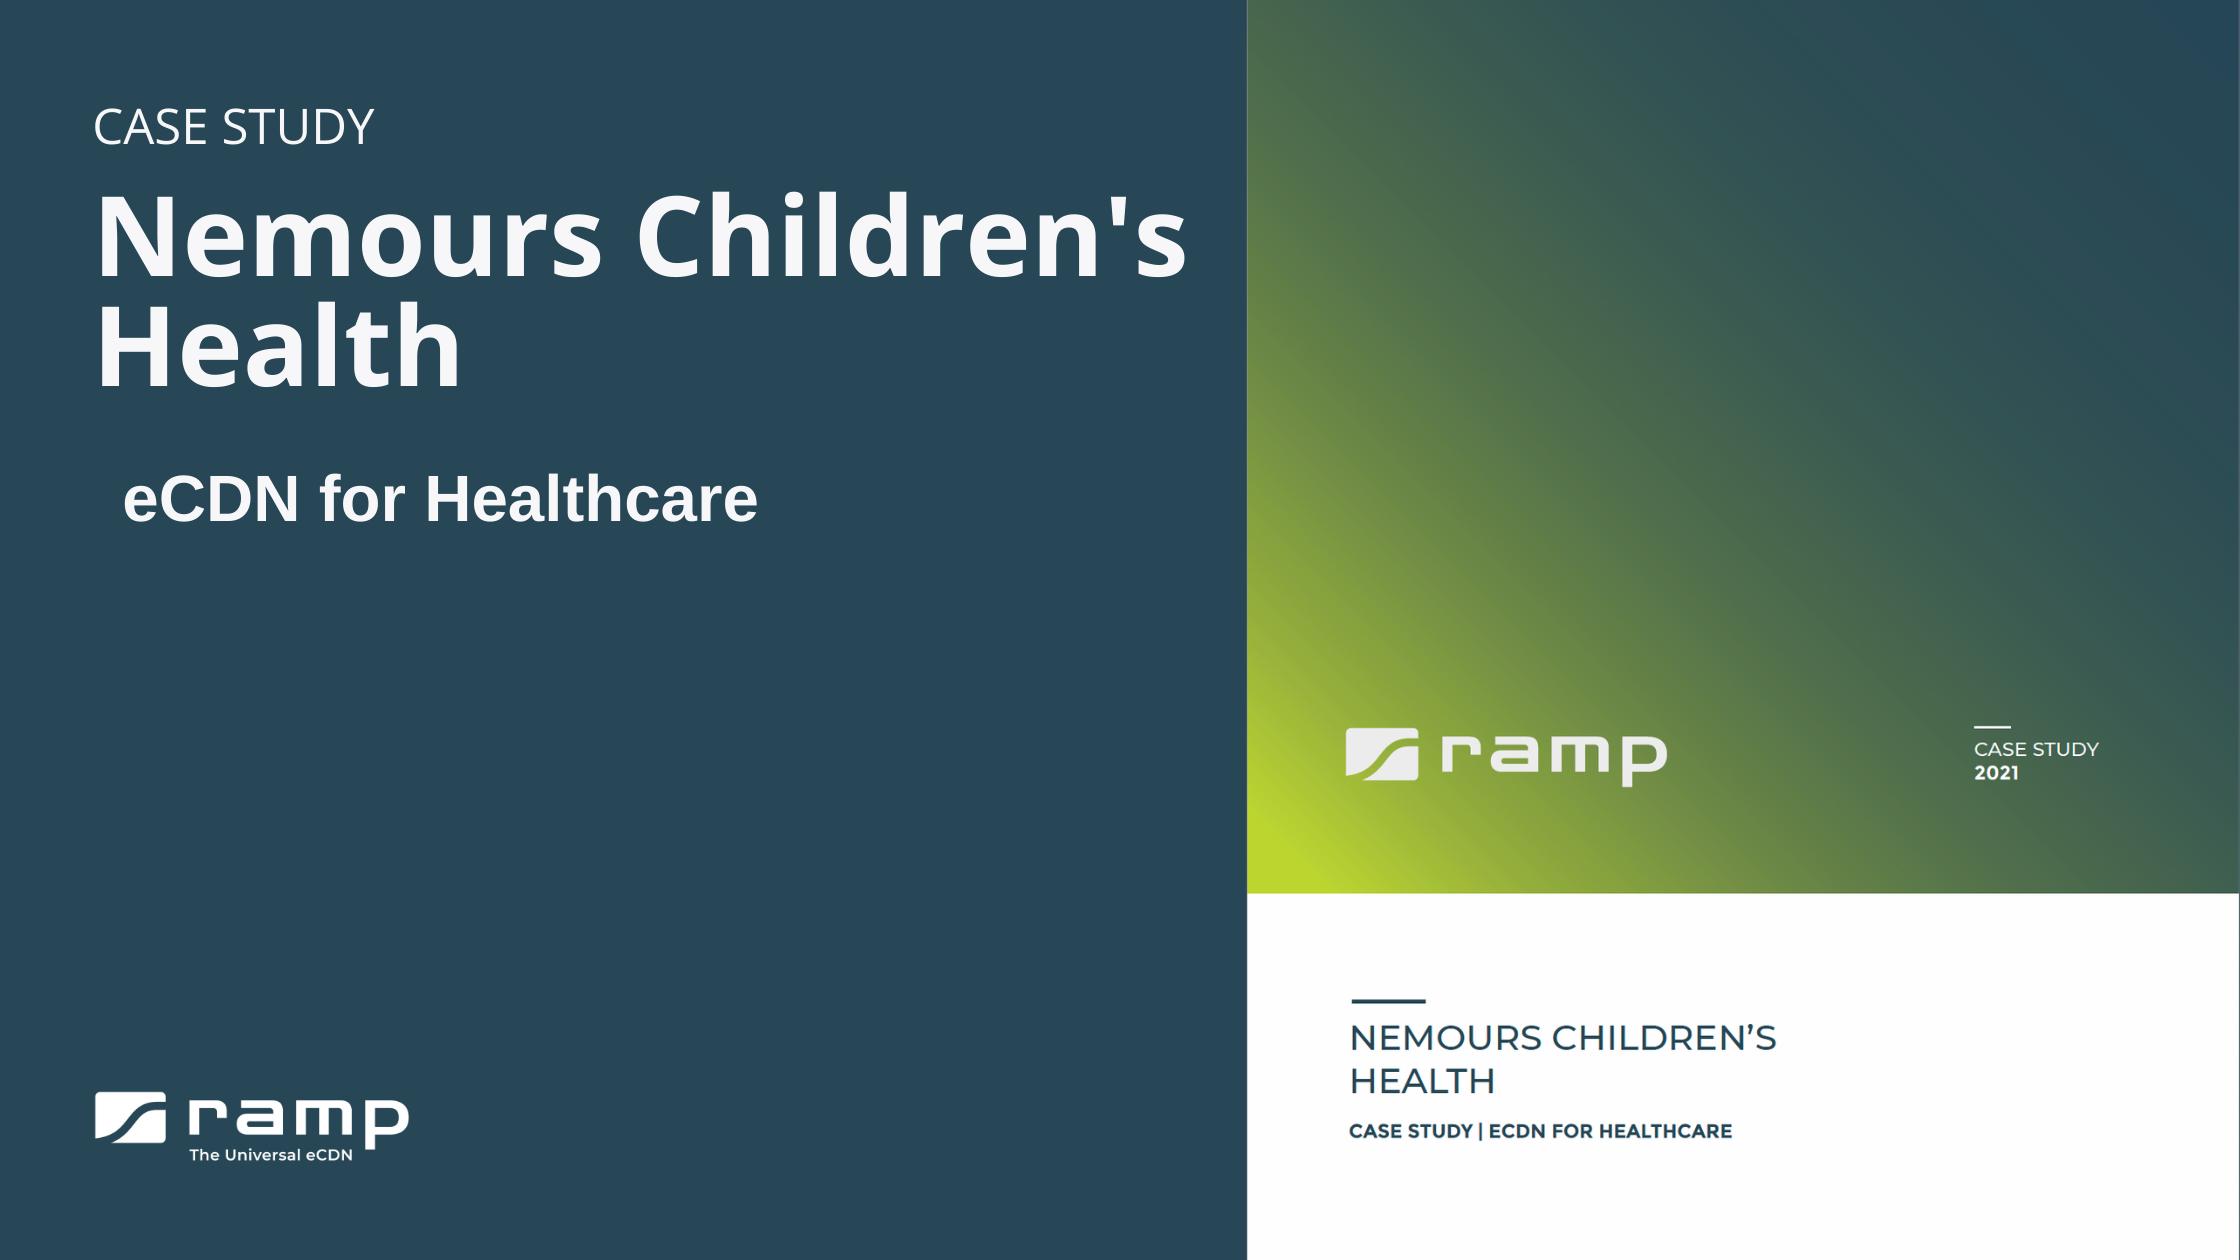 Nemours Children's Health Case Study